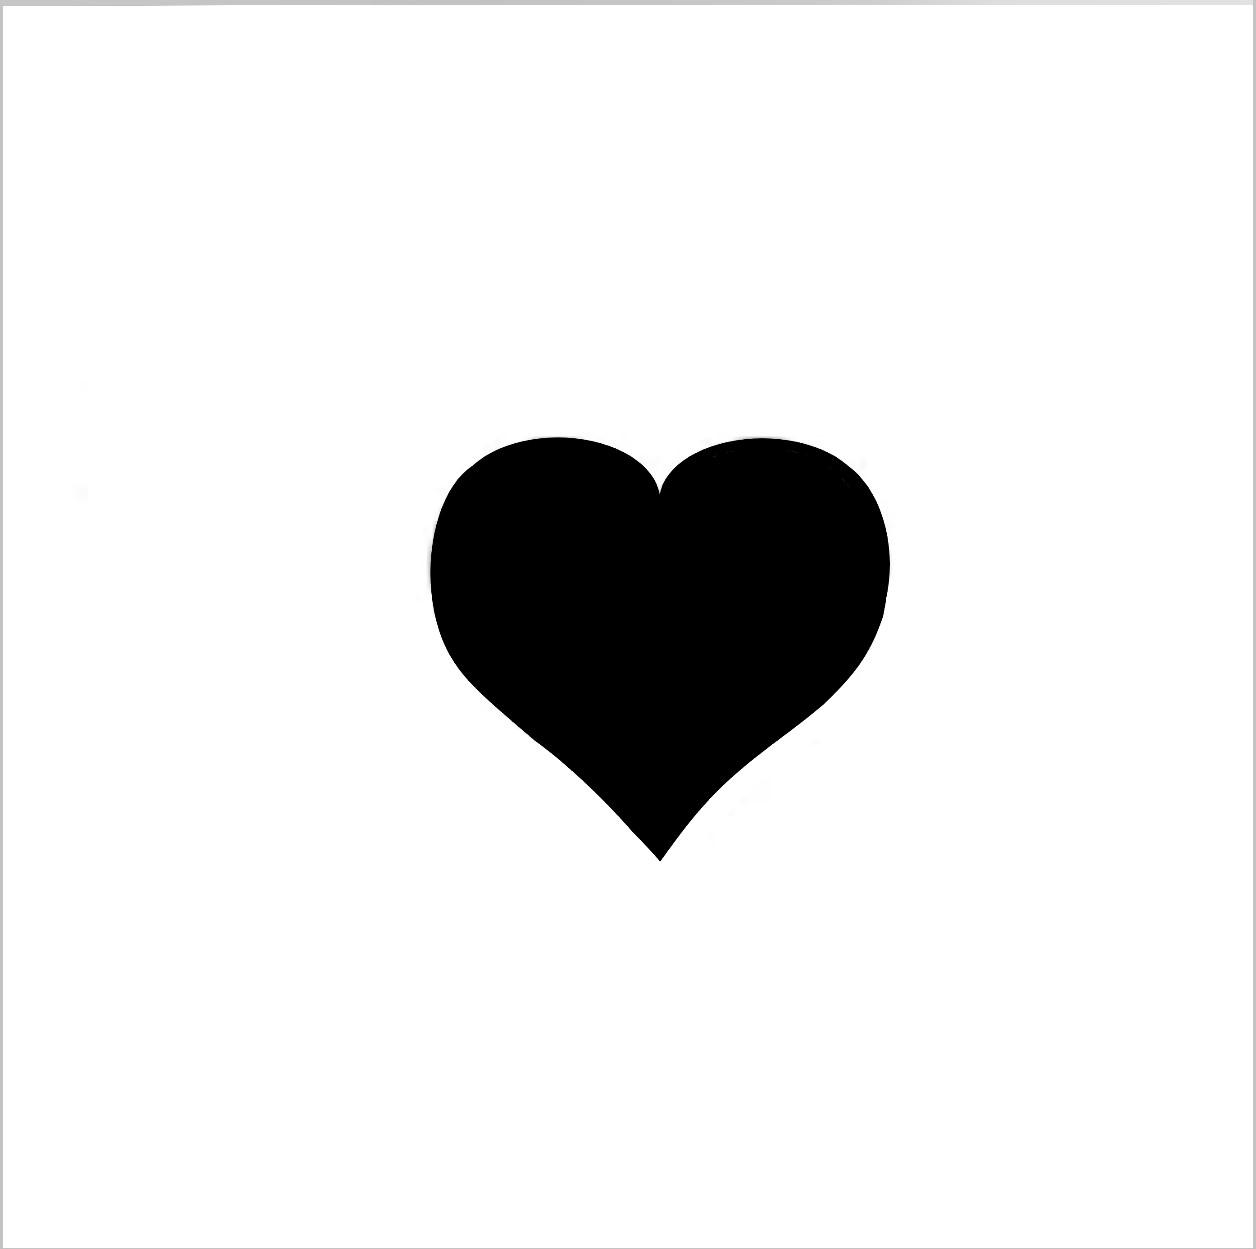 Heart Professional Stencil Insert(Small)